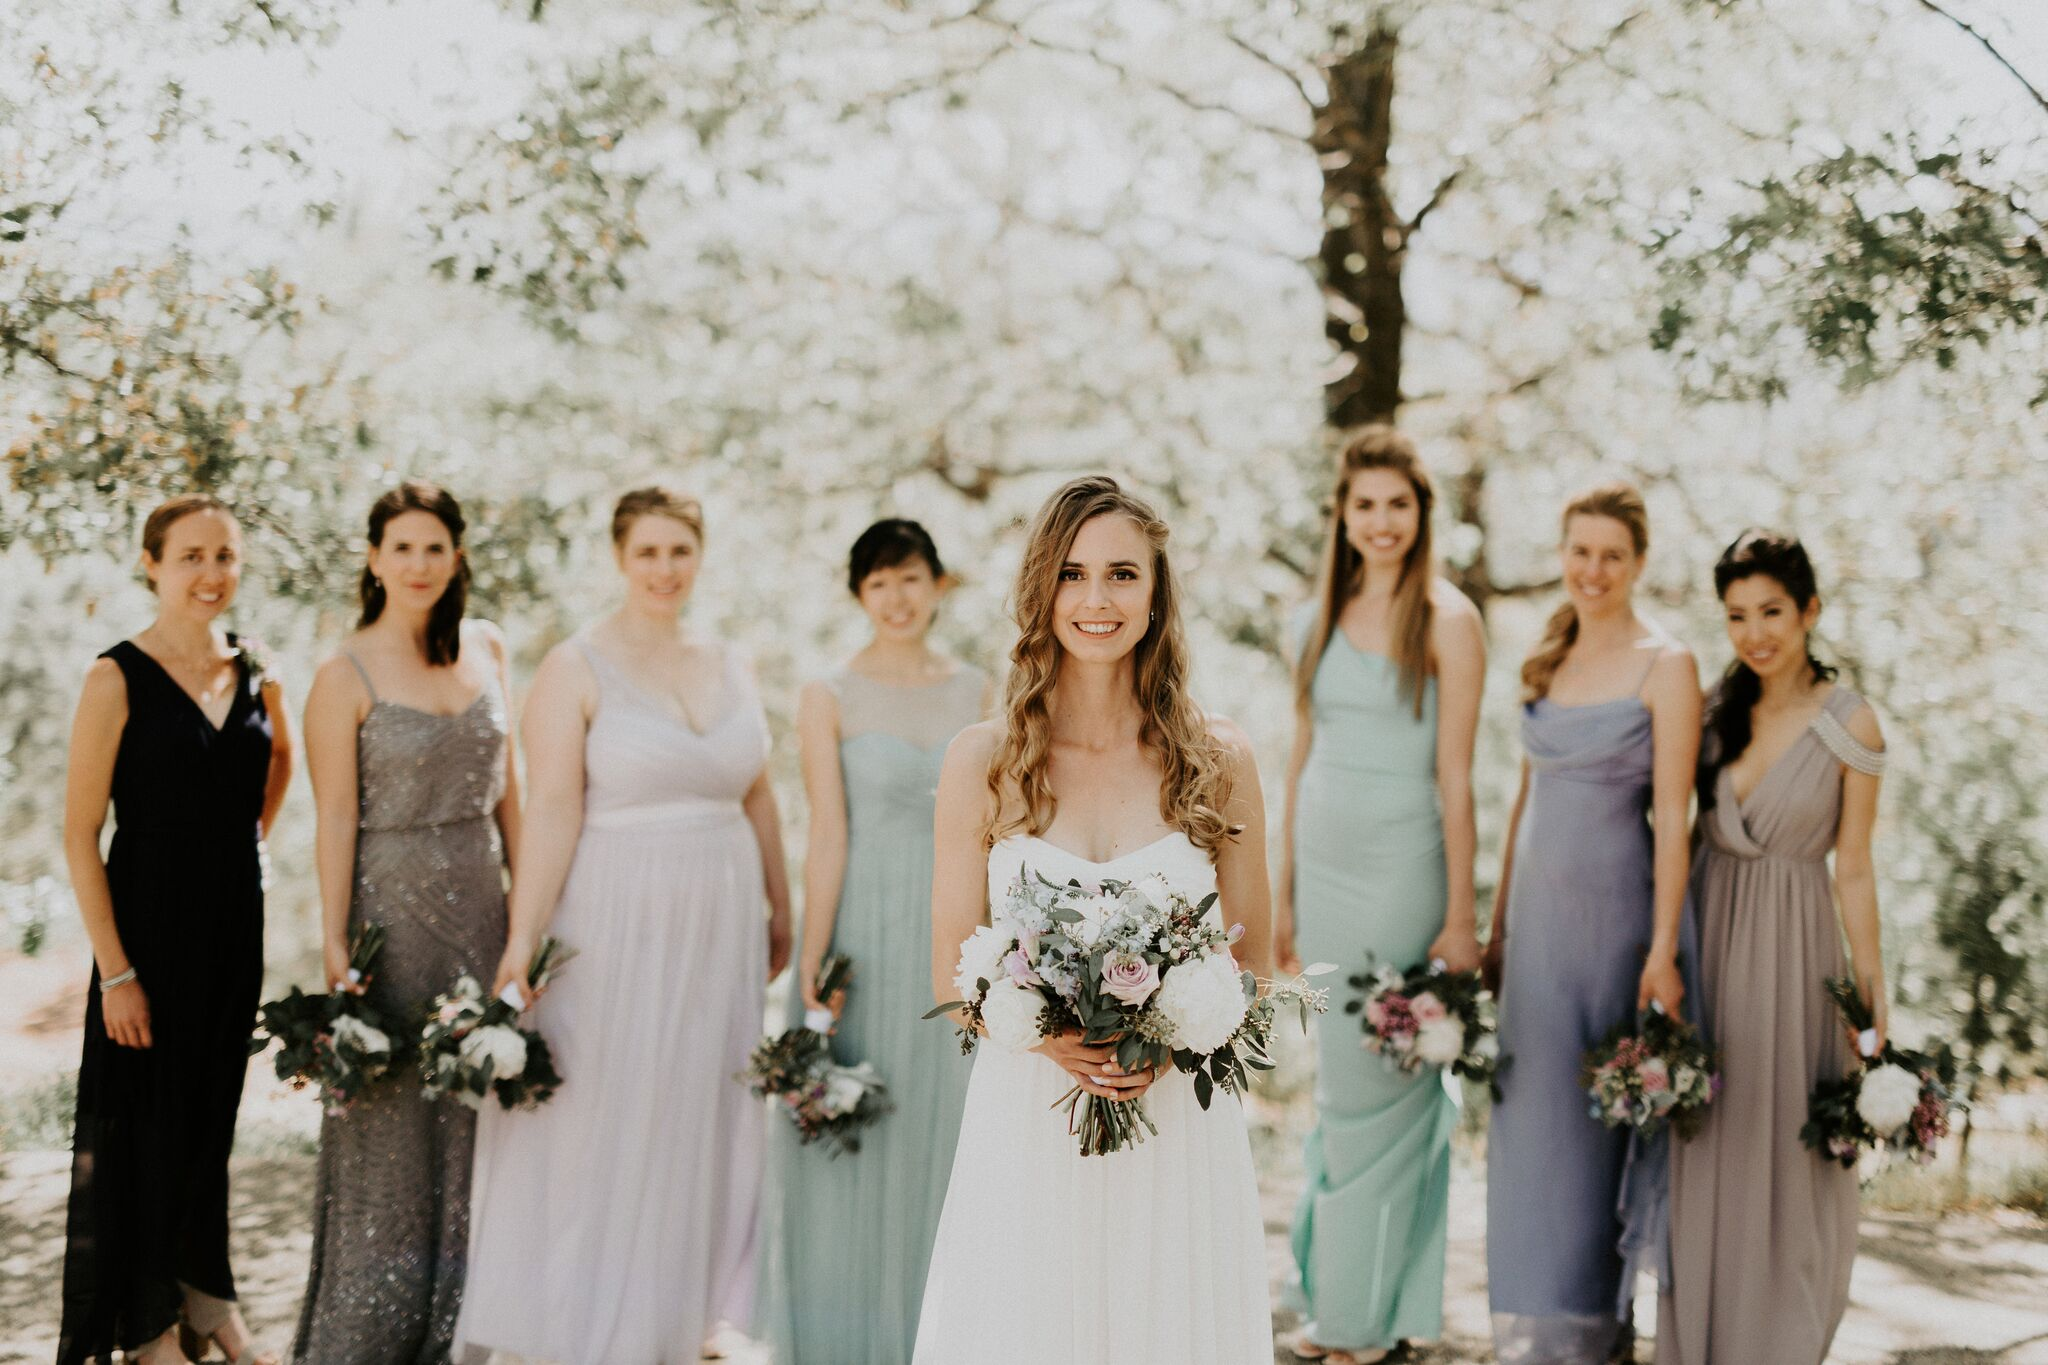 99 - Bridesmaids_preview.jpg